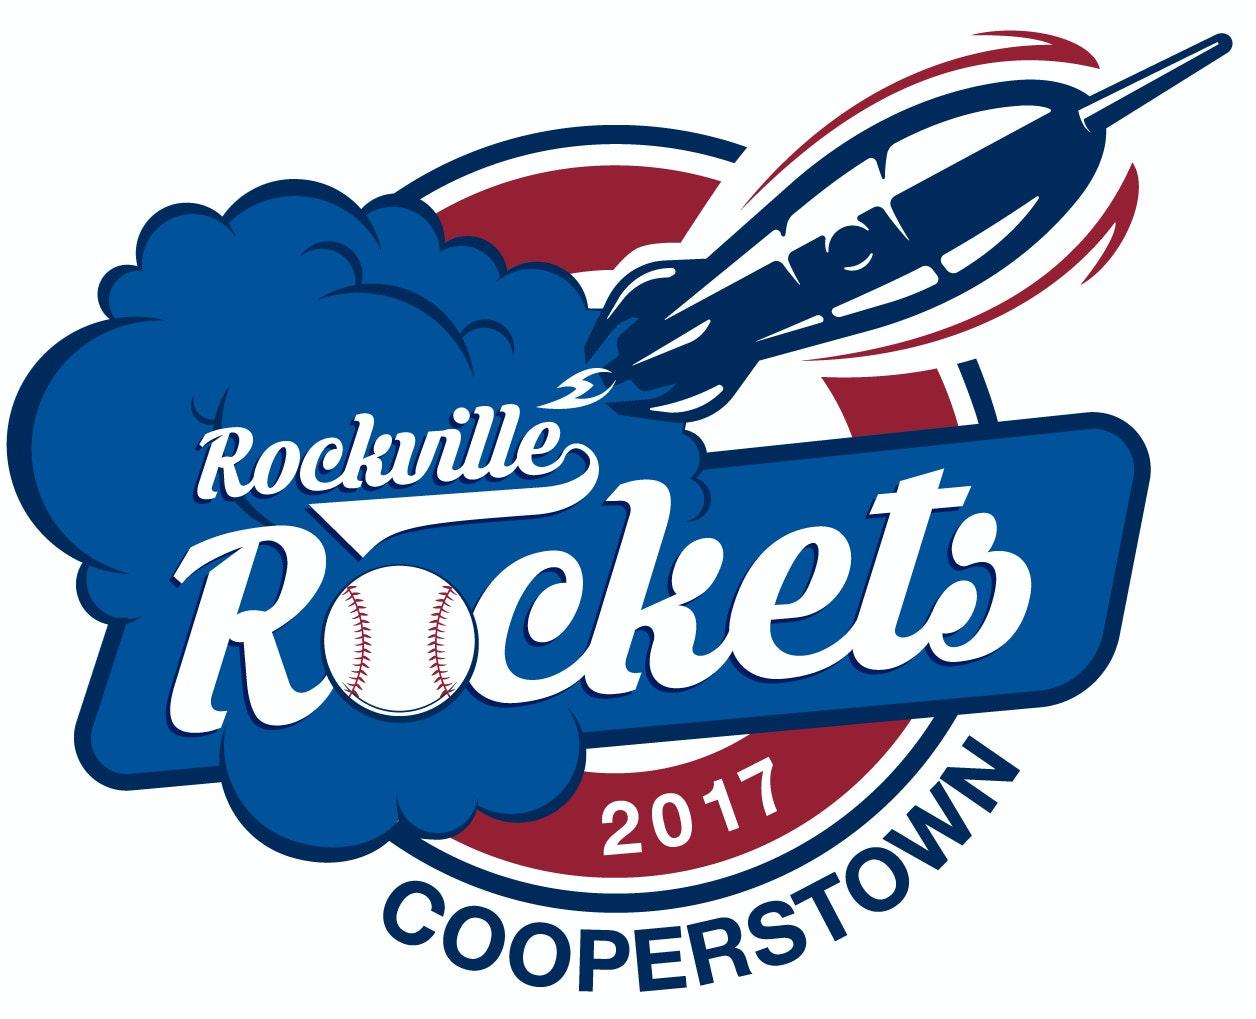 Rockville Rockets